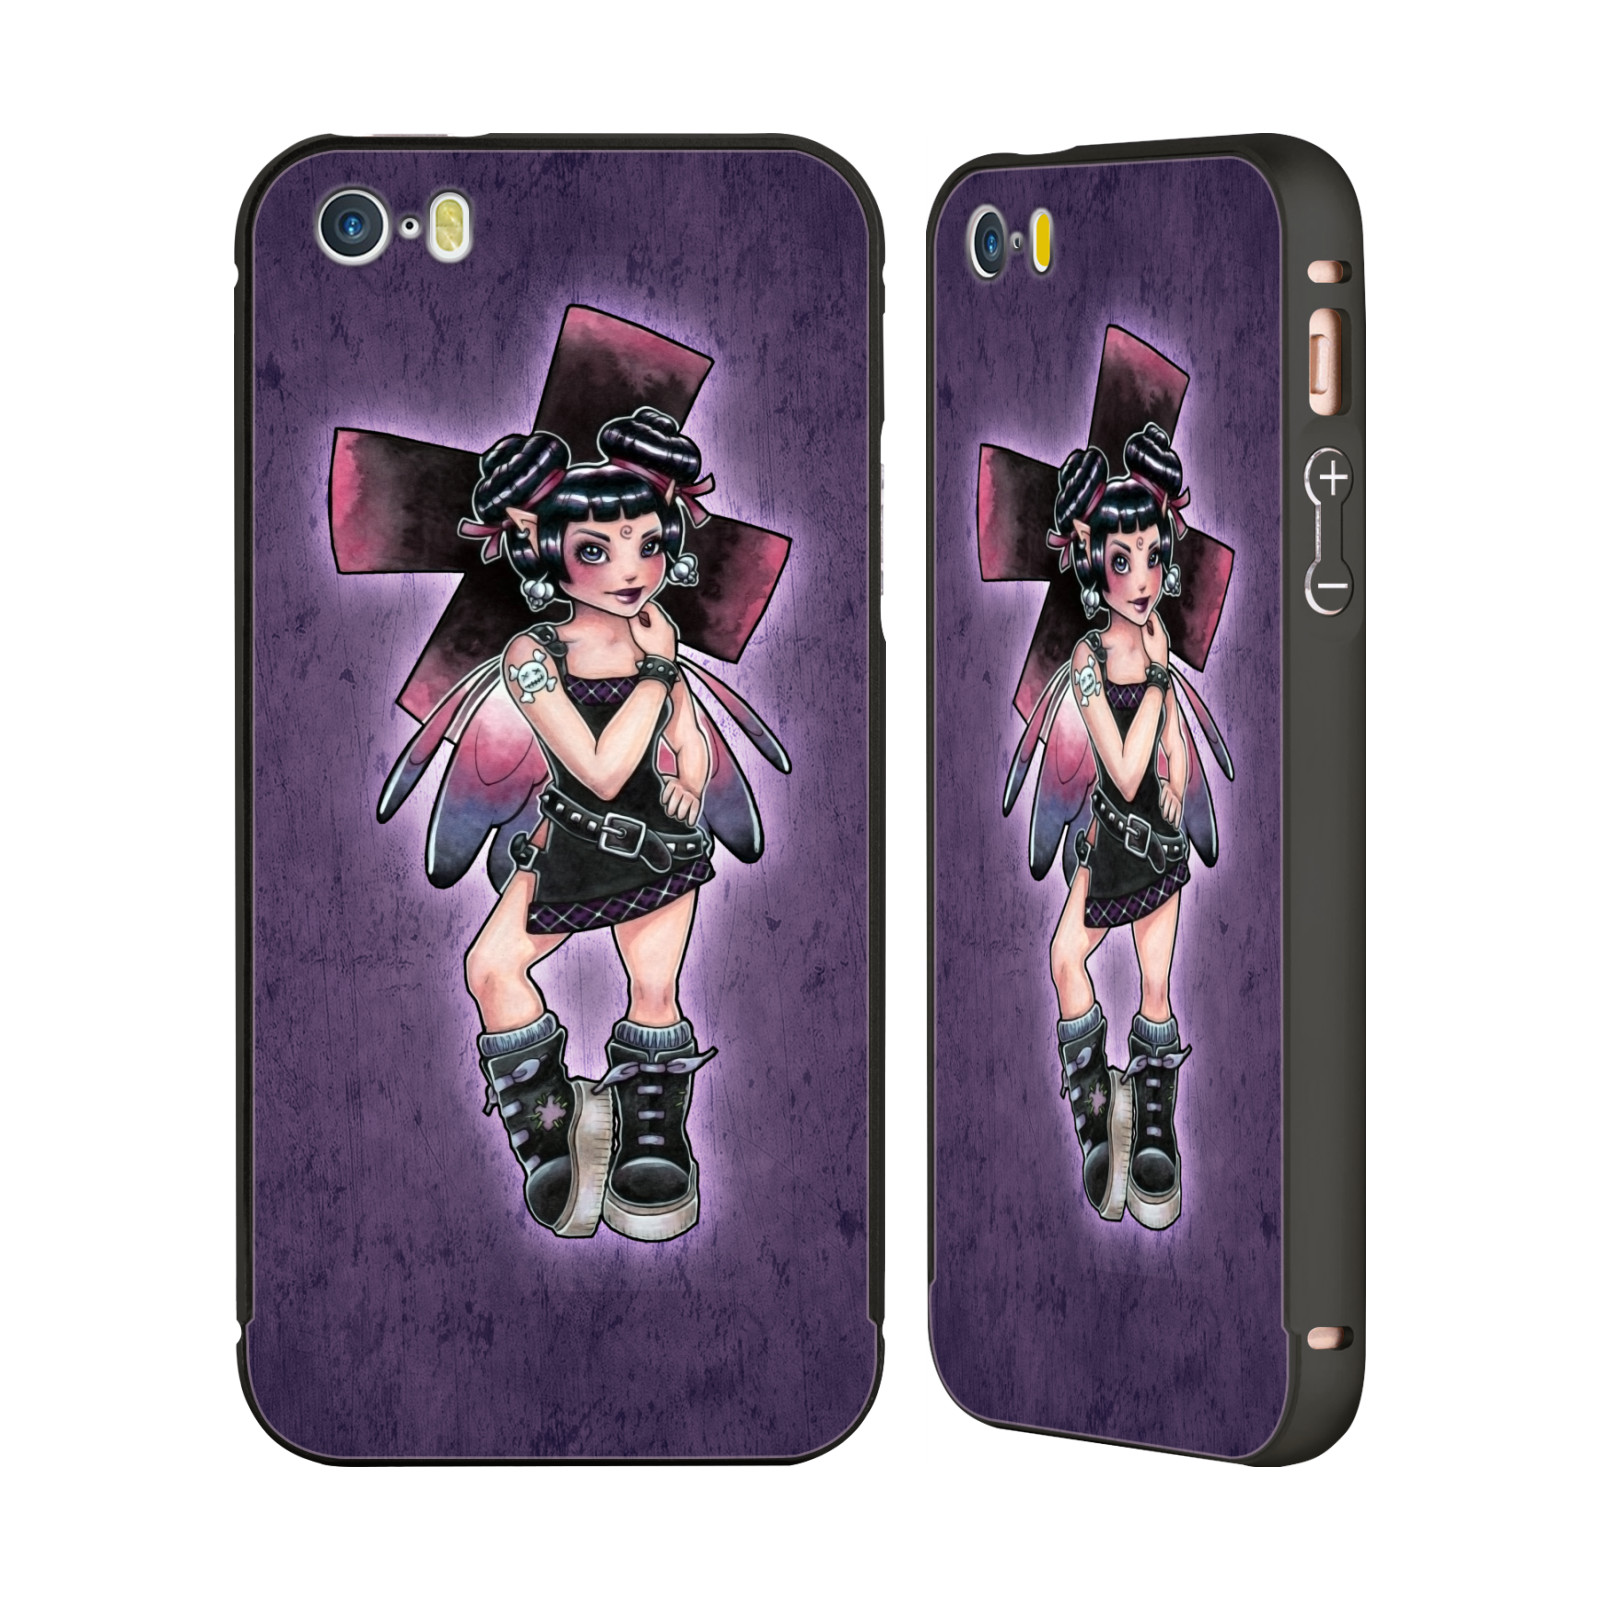 OFFICIAL-BRIGID-ASHWOOD-FAIRIES-2-BLACK-SLIDER-CASE-FOR-APPLE-iPHONE-PHONES